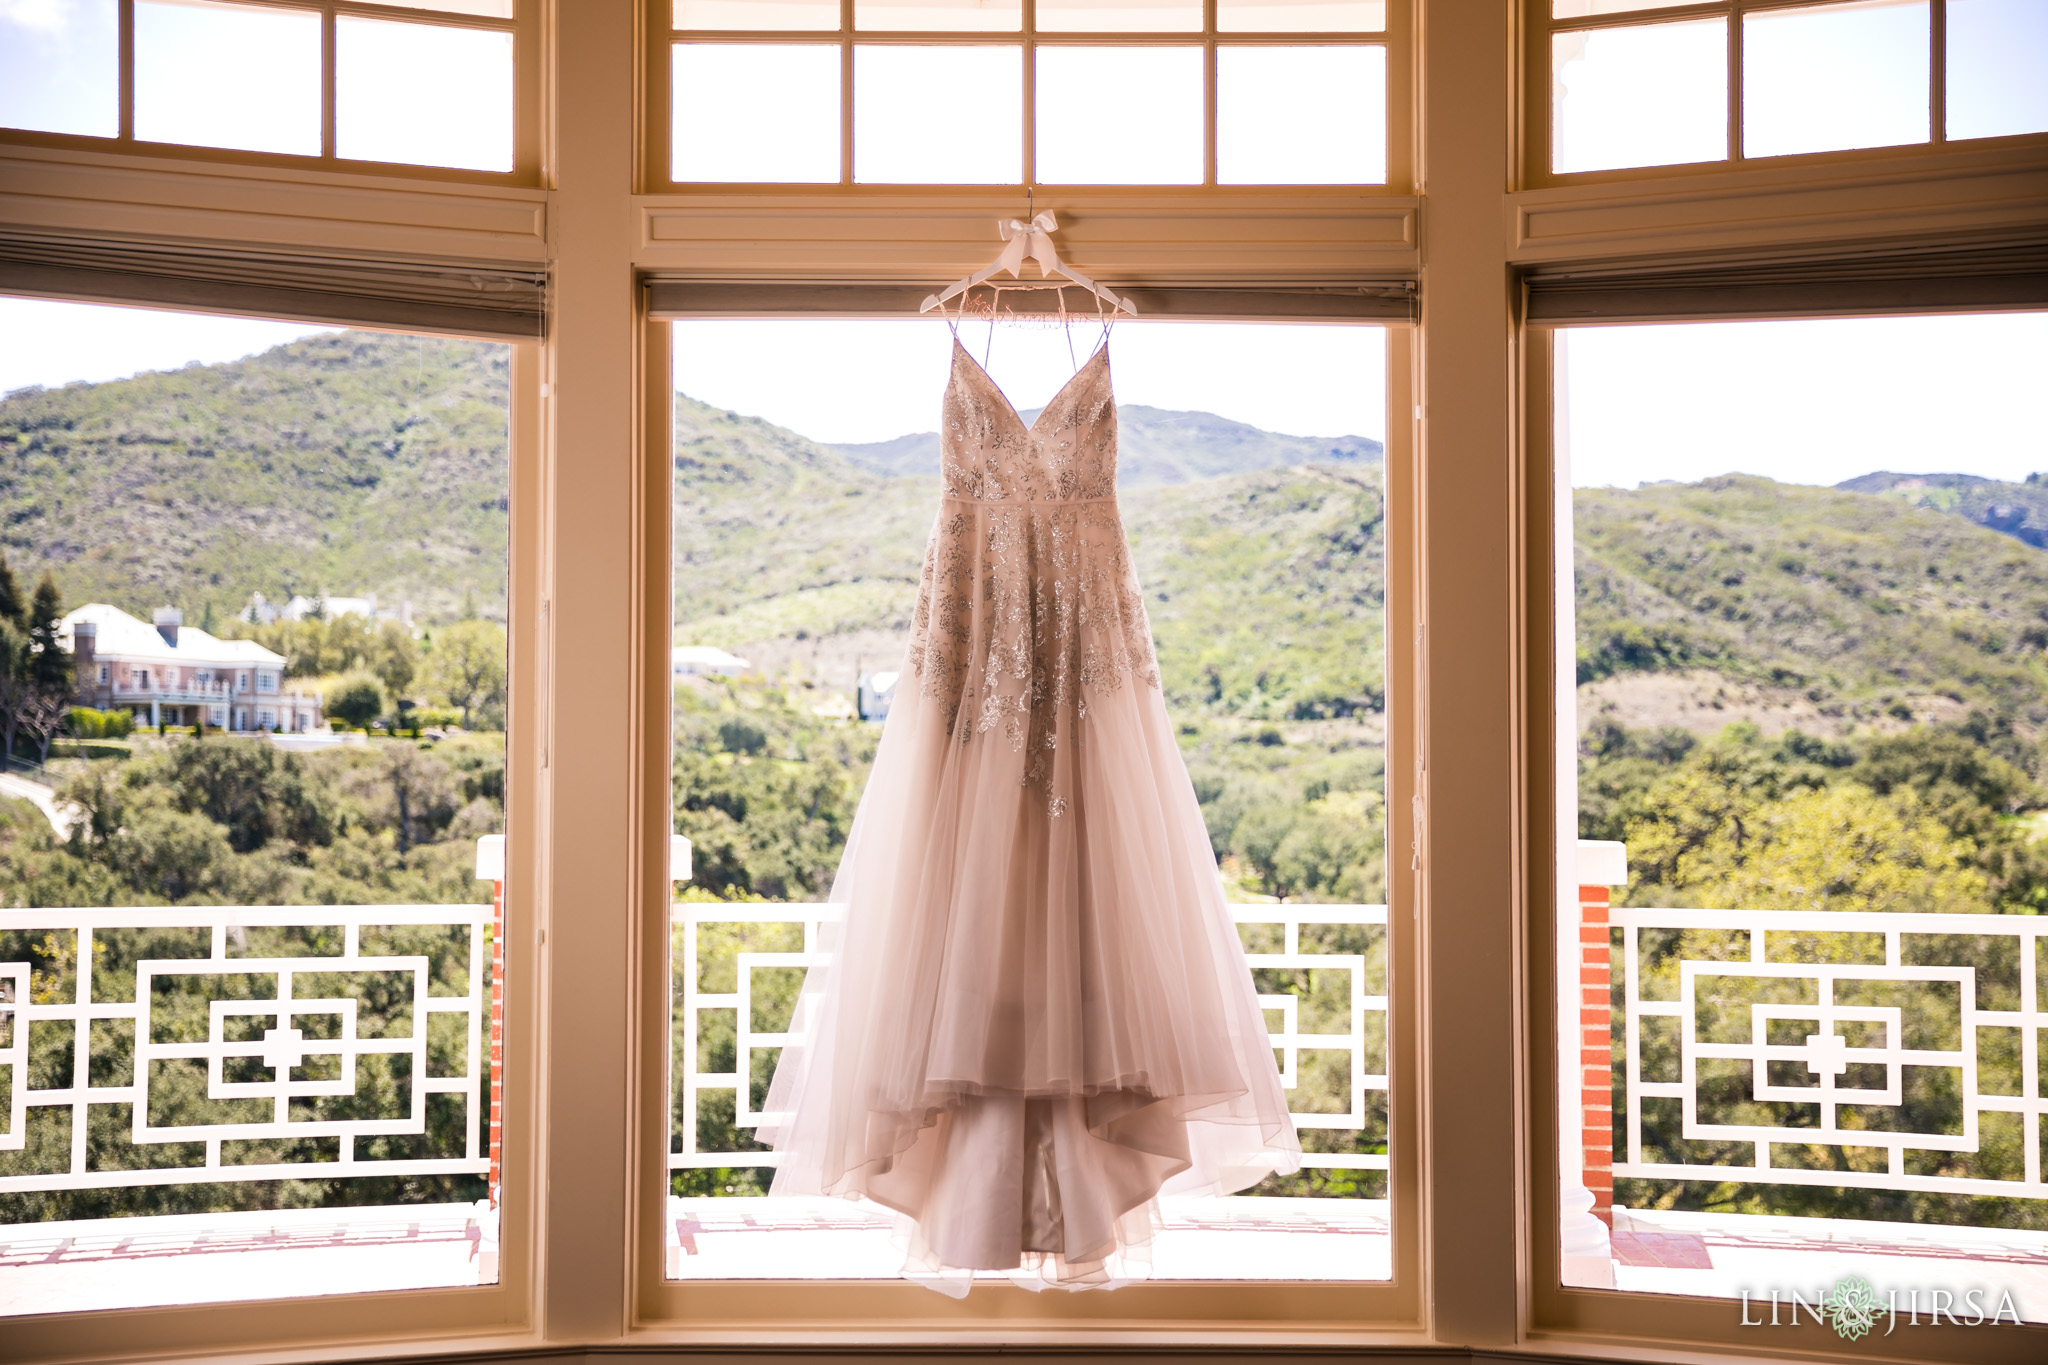 01 sherwood country club ventura county bride wedding photography